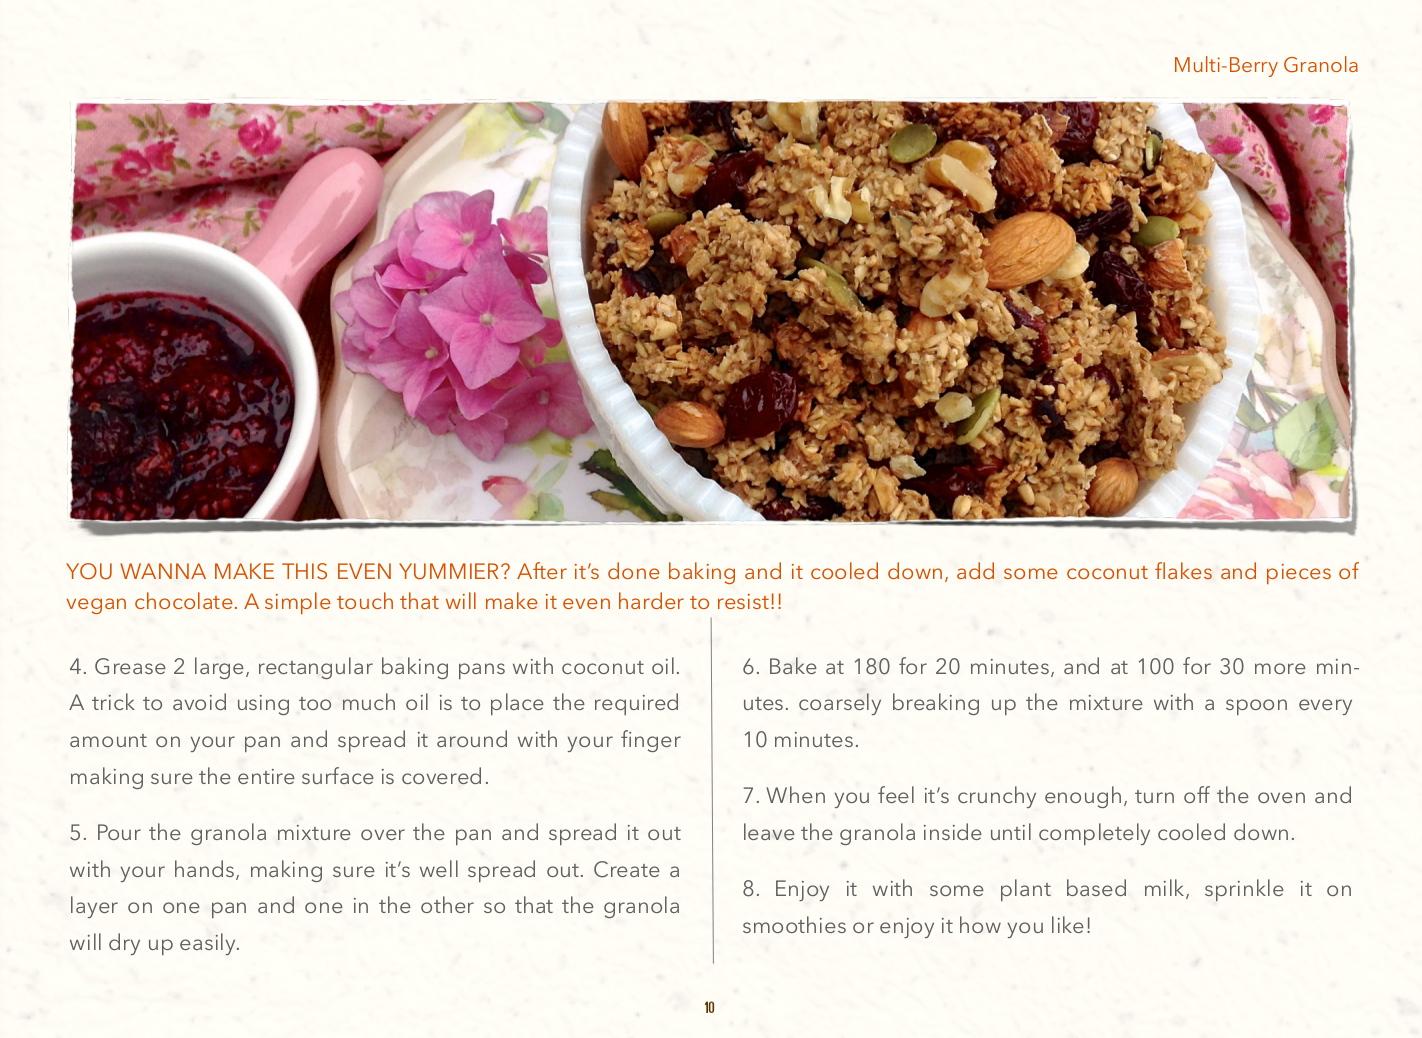 paleo gluten sugar dairy aip recipes multi berry grandola 3